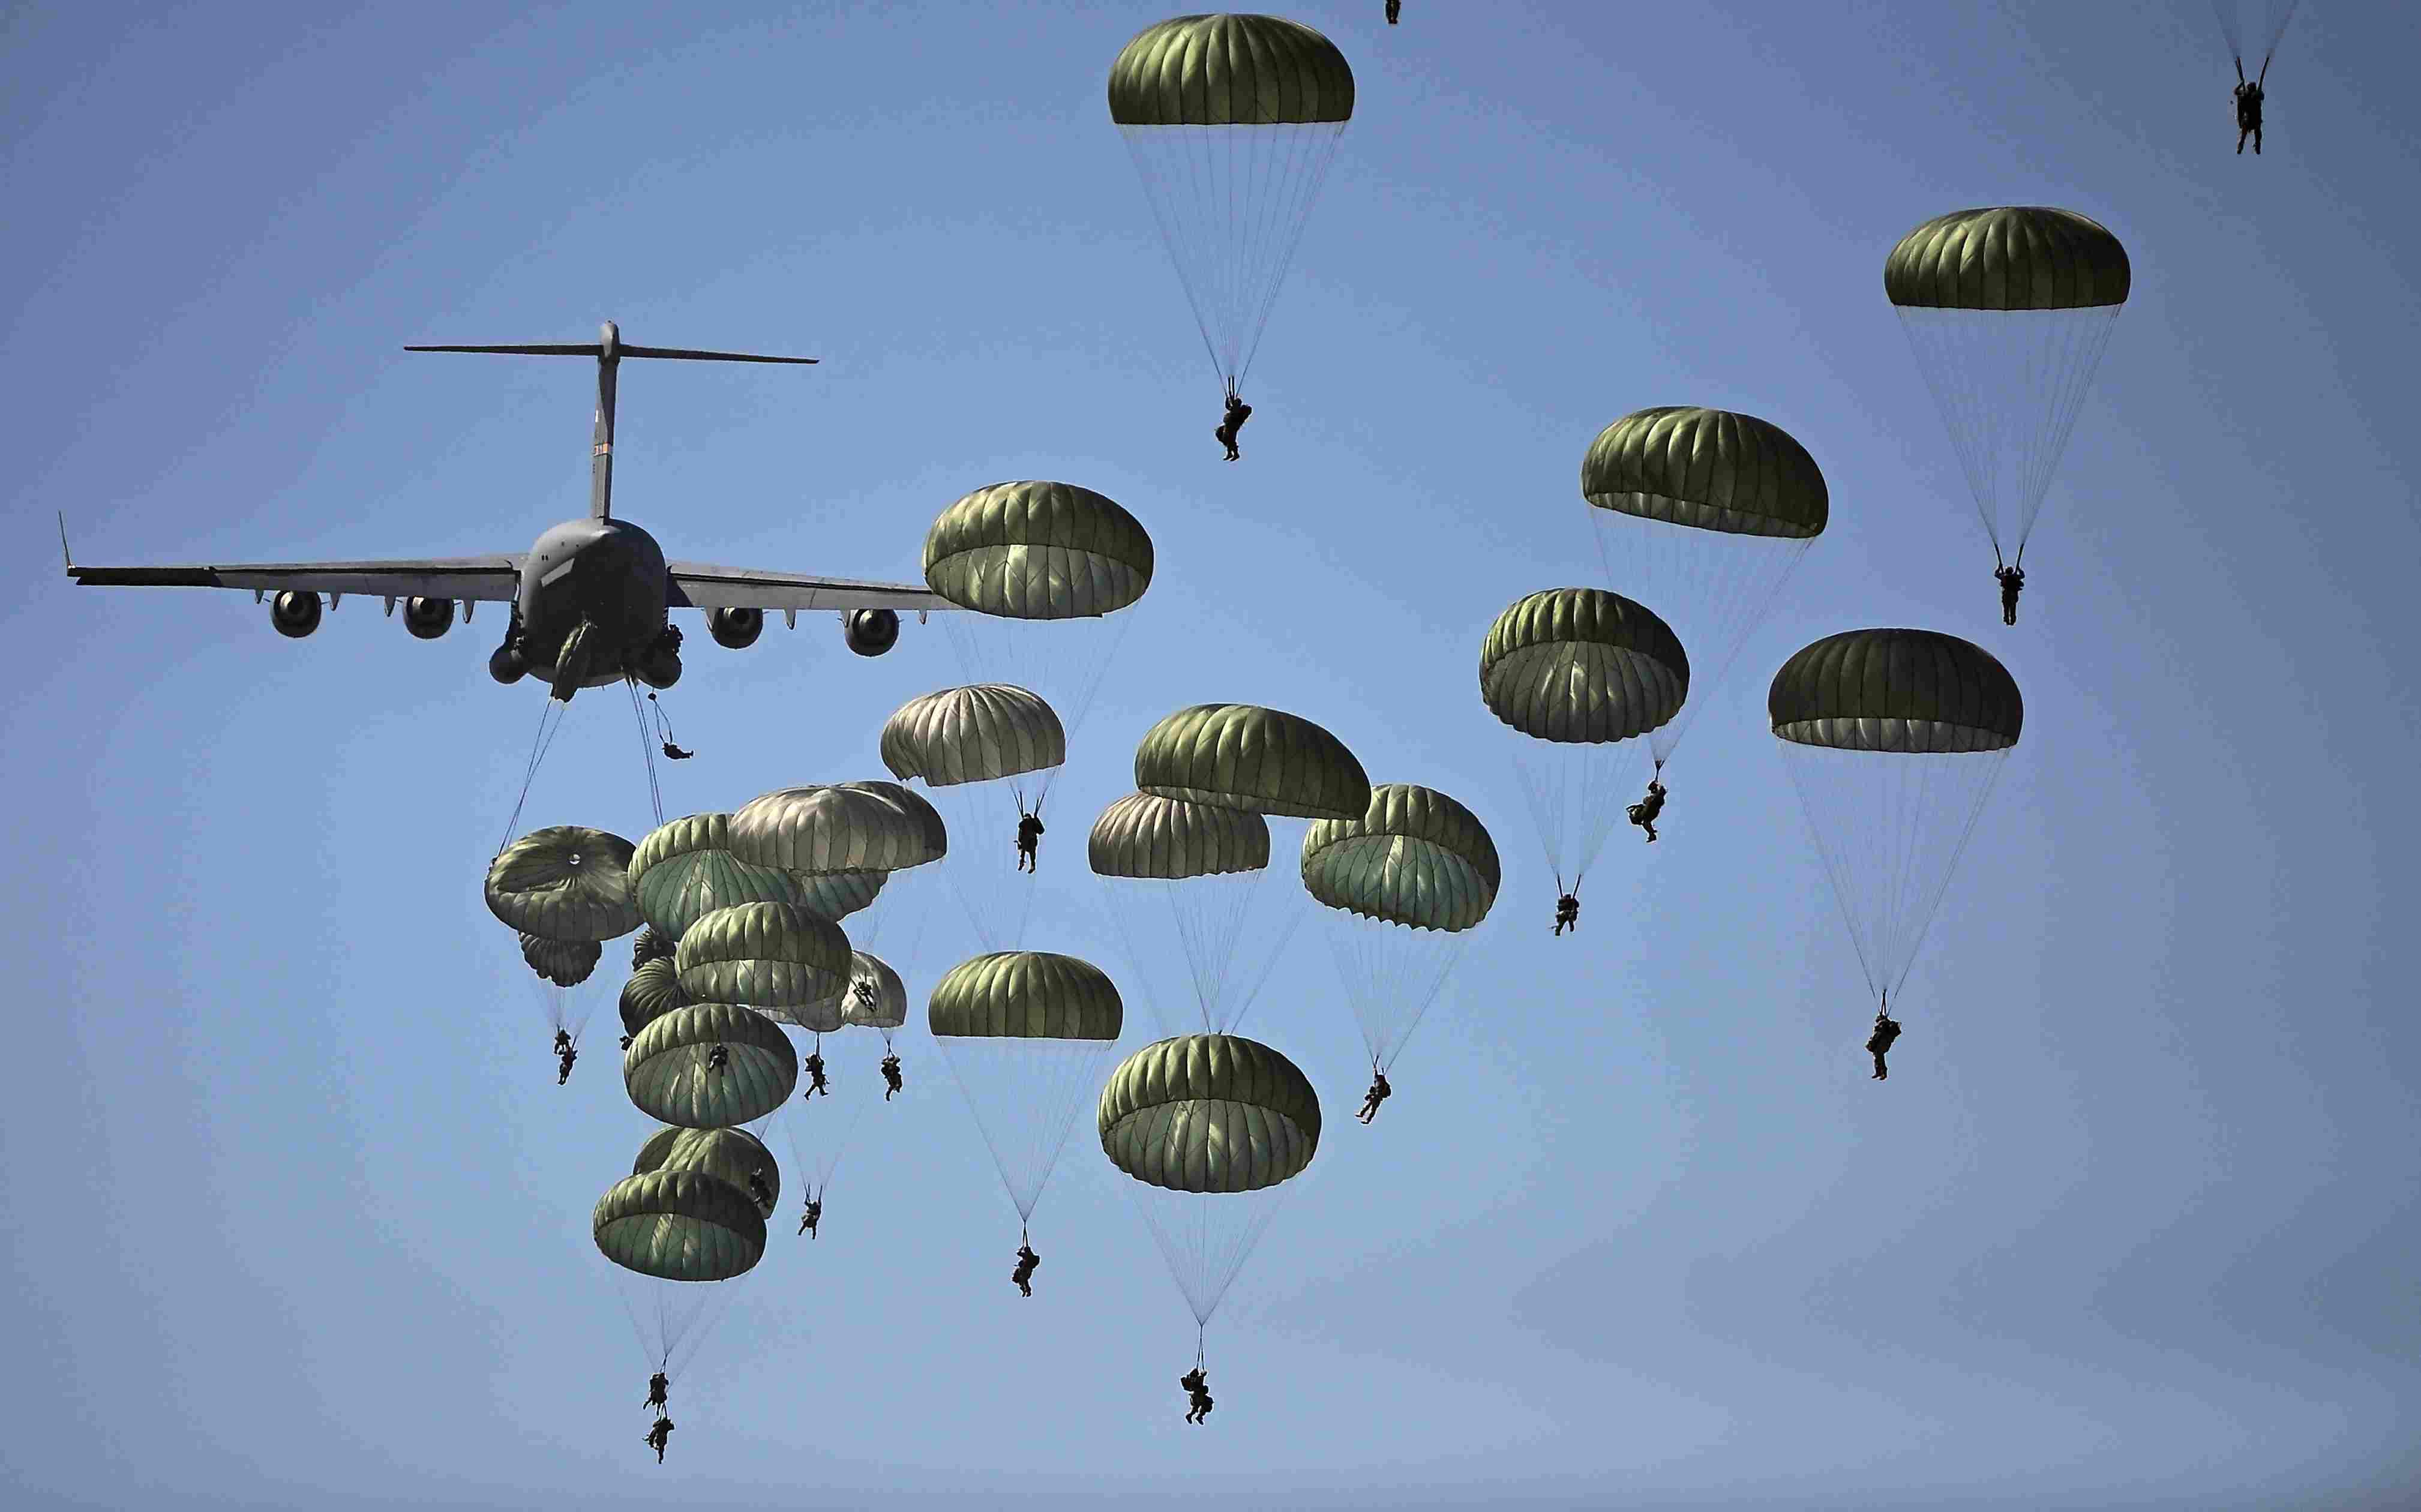 US Army Parachute